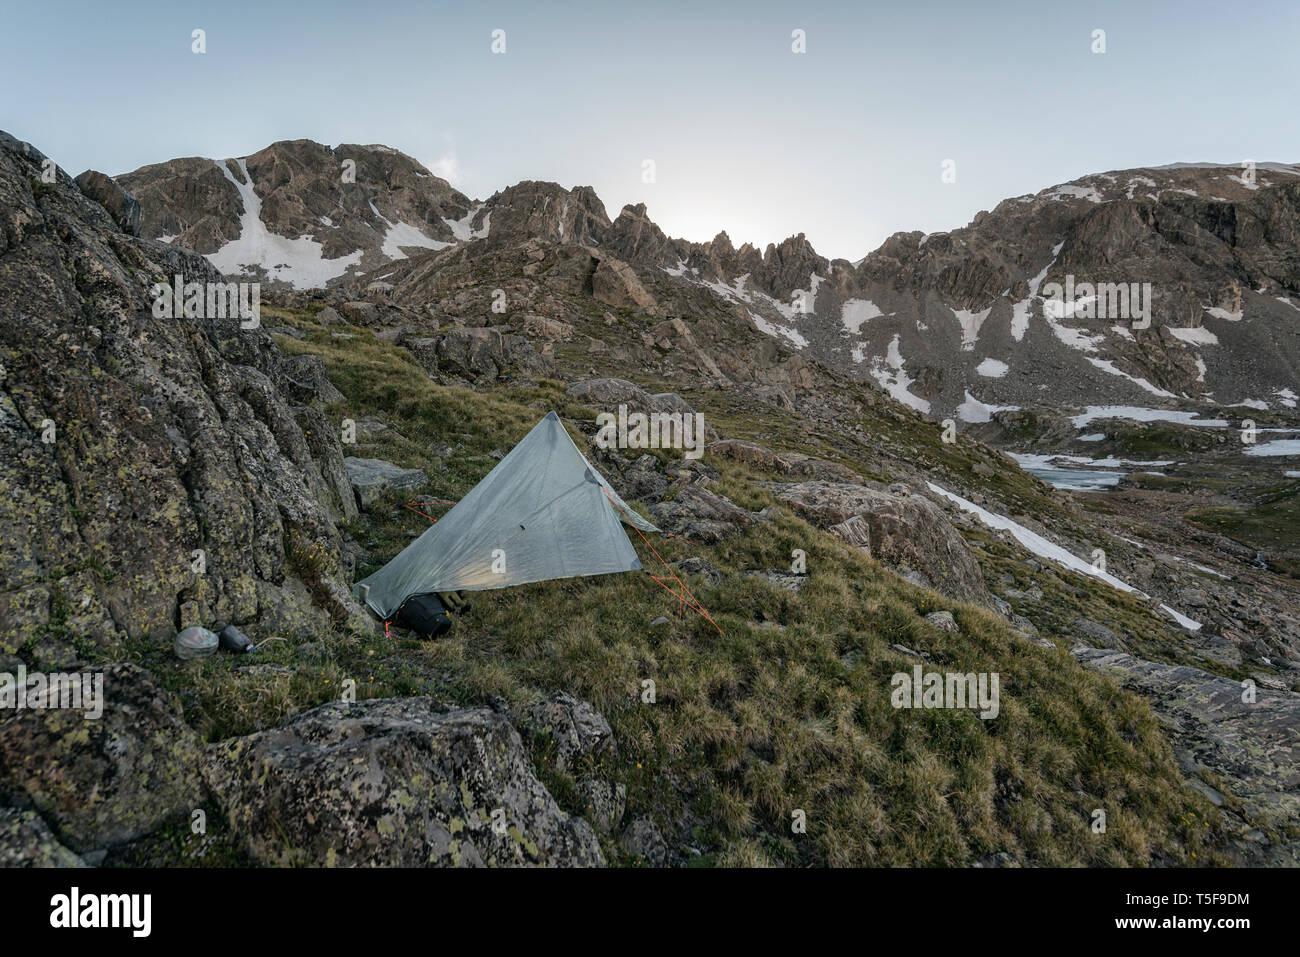 Alpine camp in Colorado - Stock Image